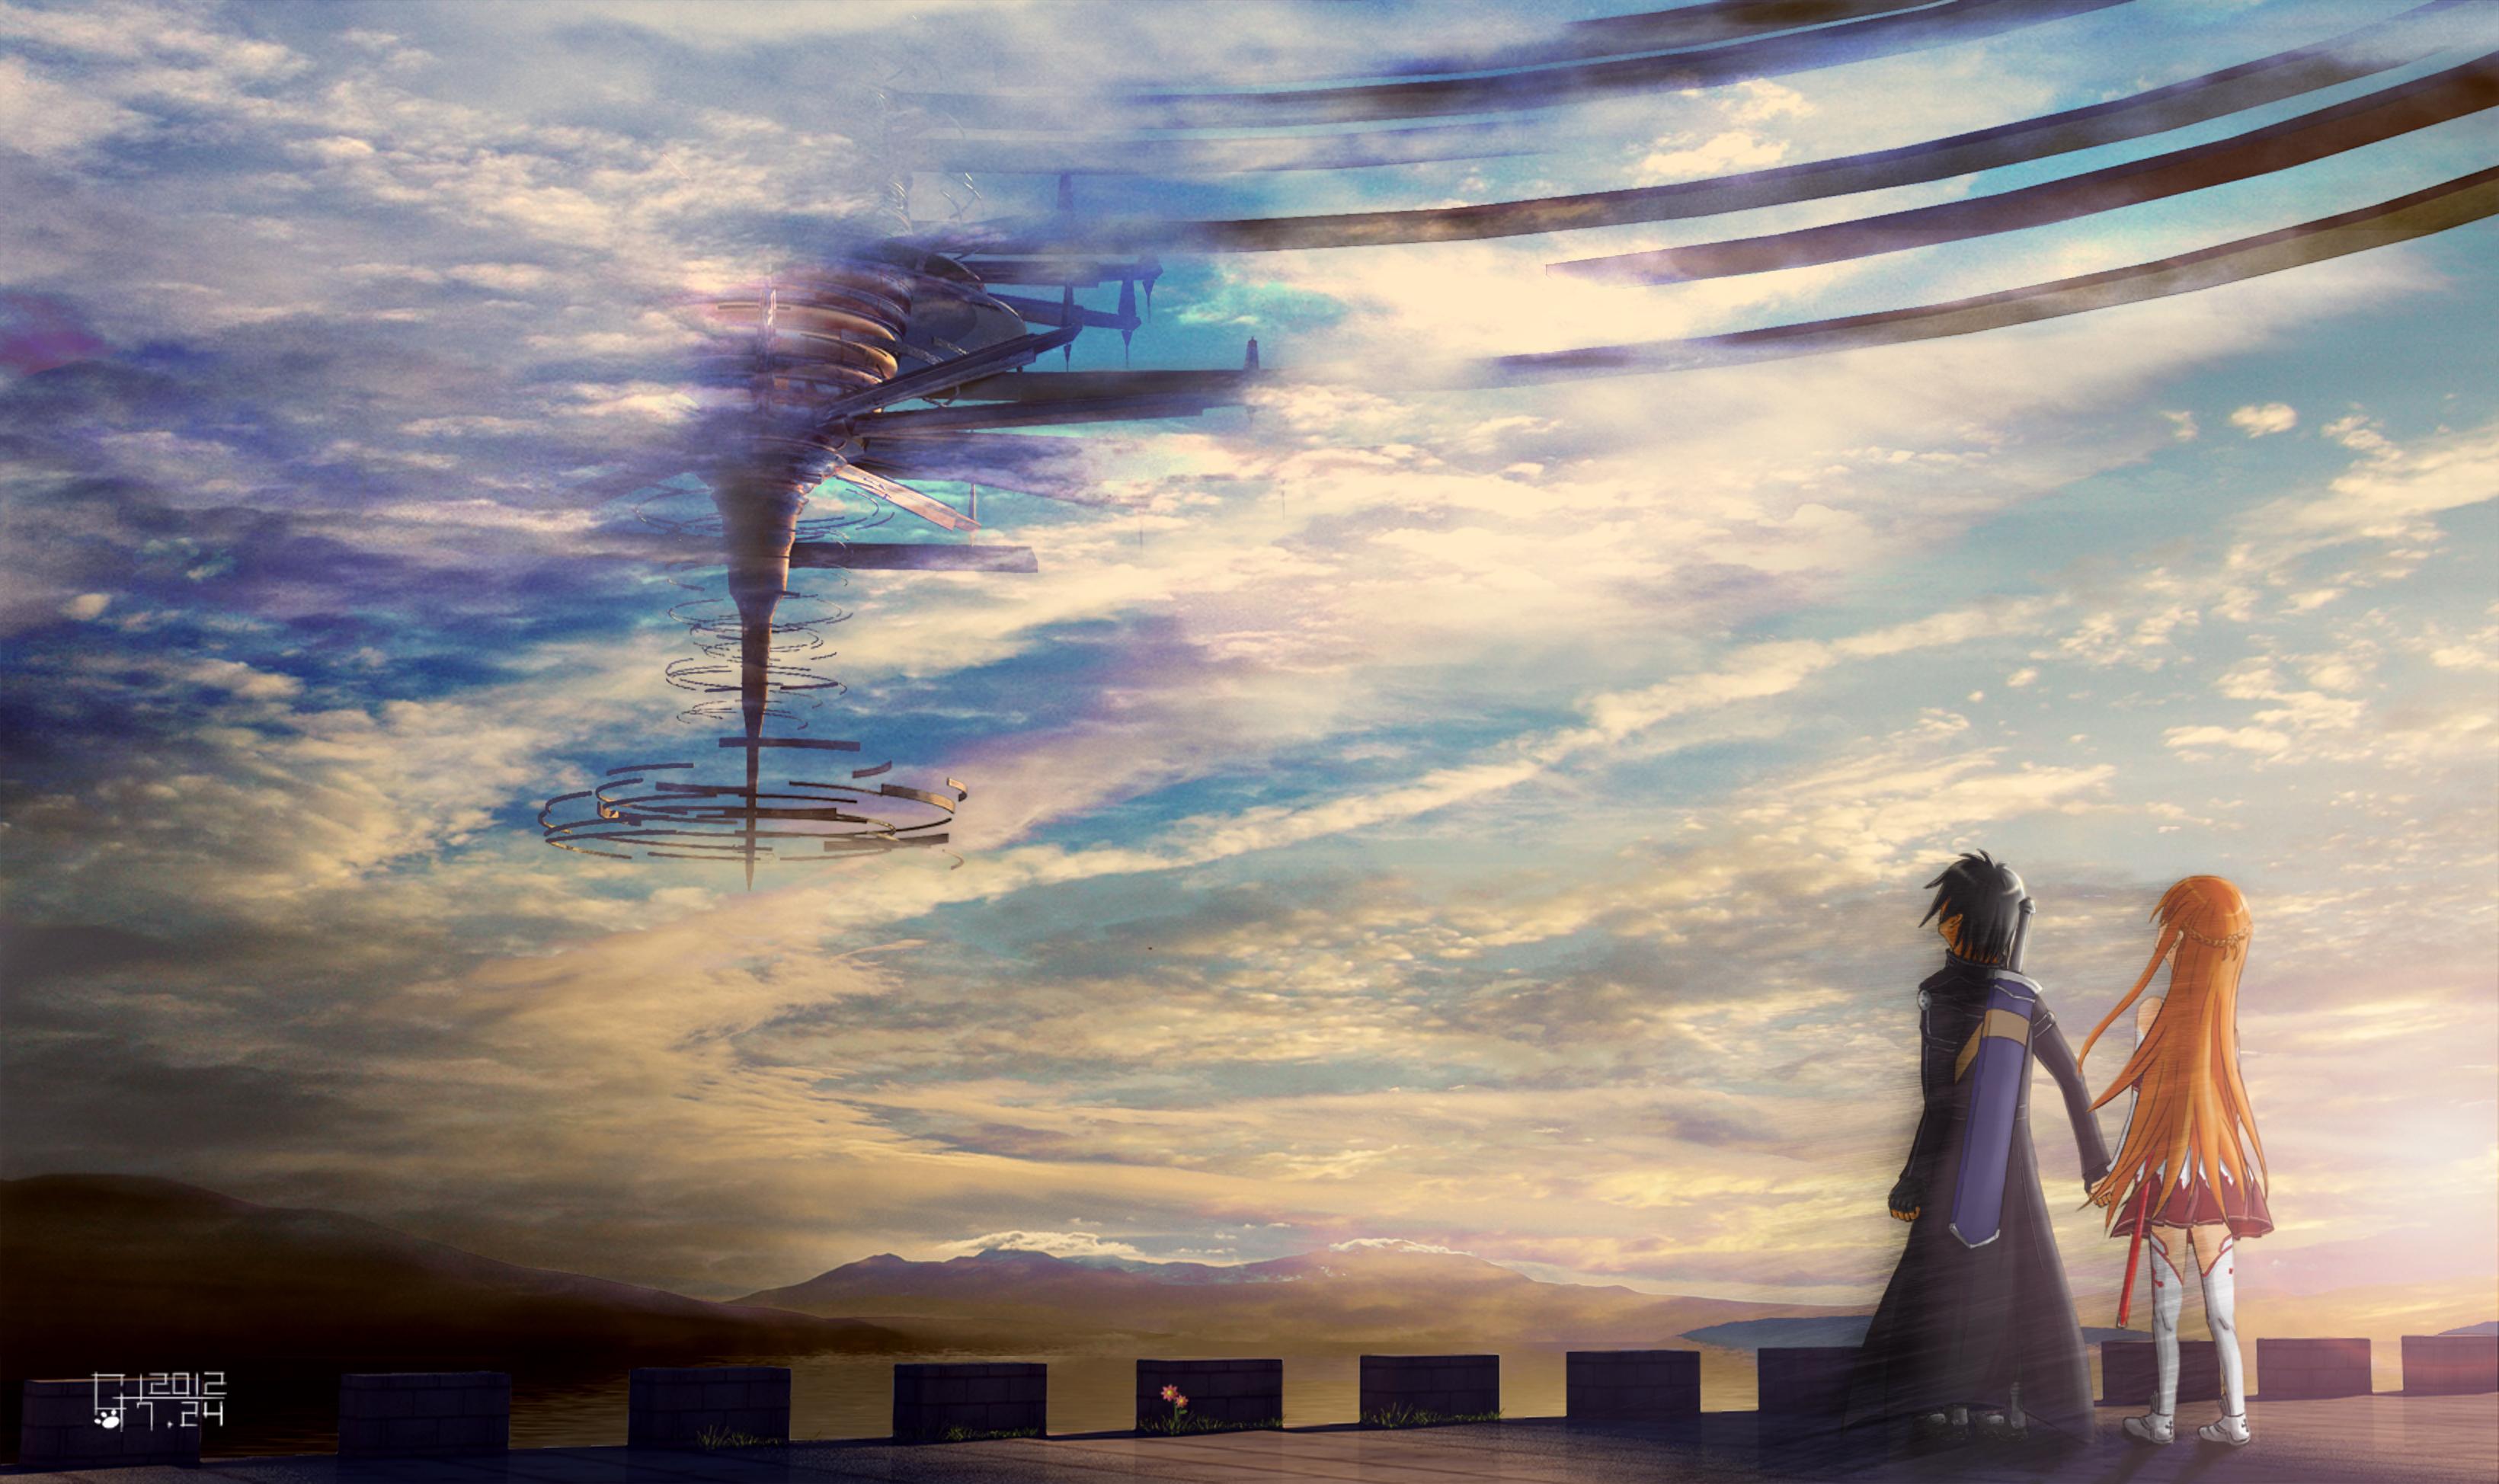 Aomine Daiki Hd Wallpaper 1167 Kirito Sword Art Online Hd Wallpapers Background